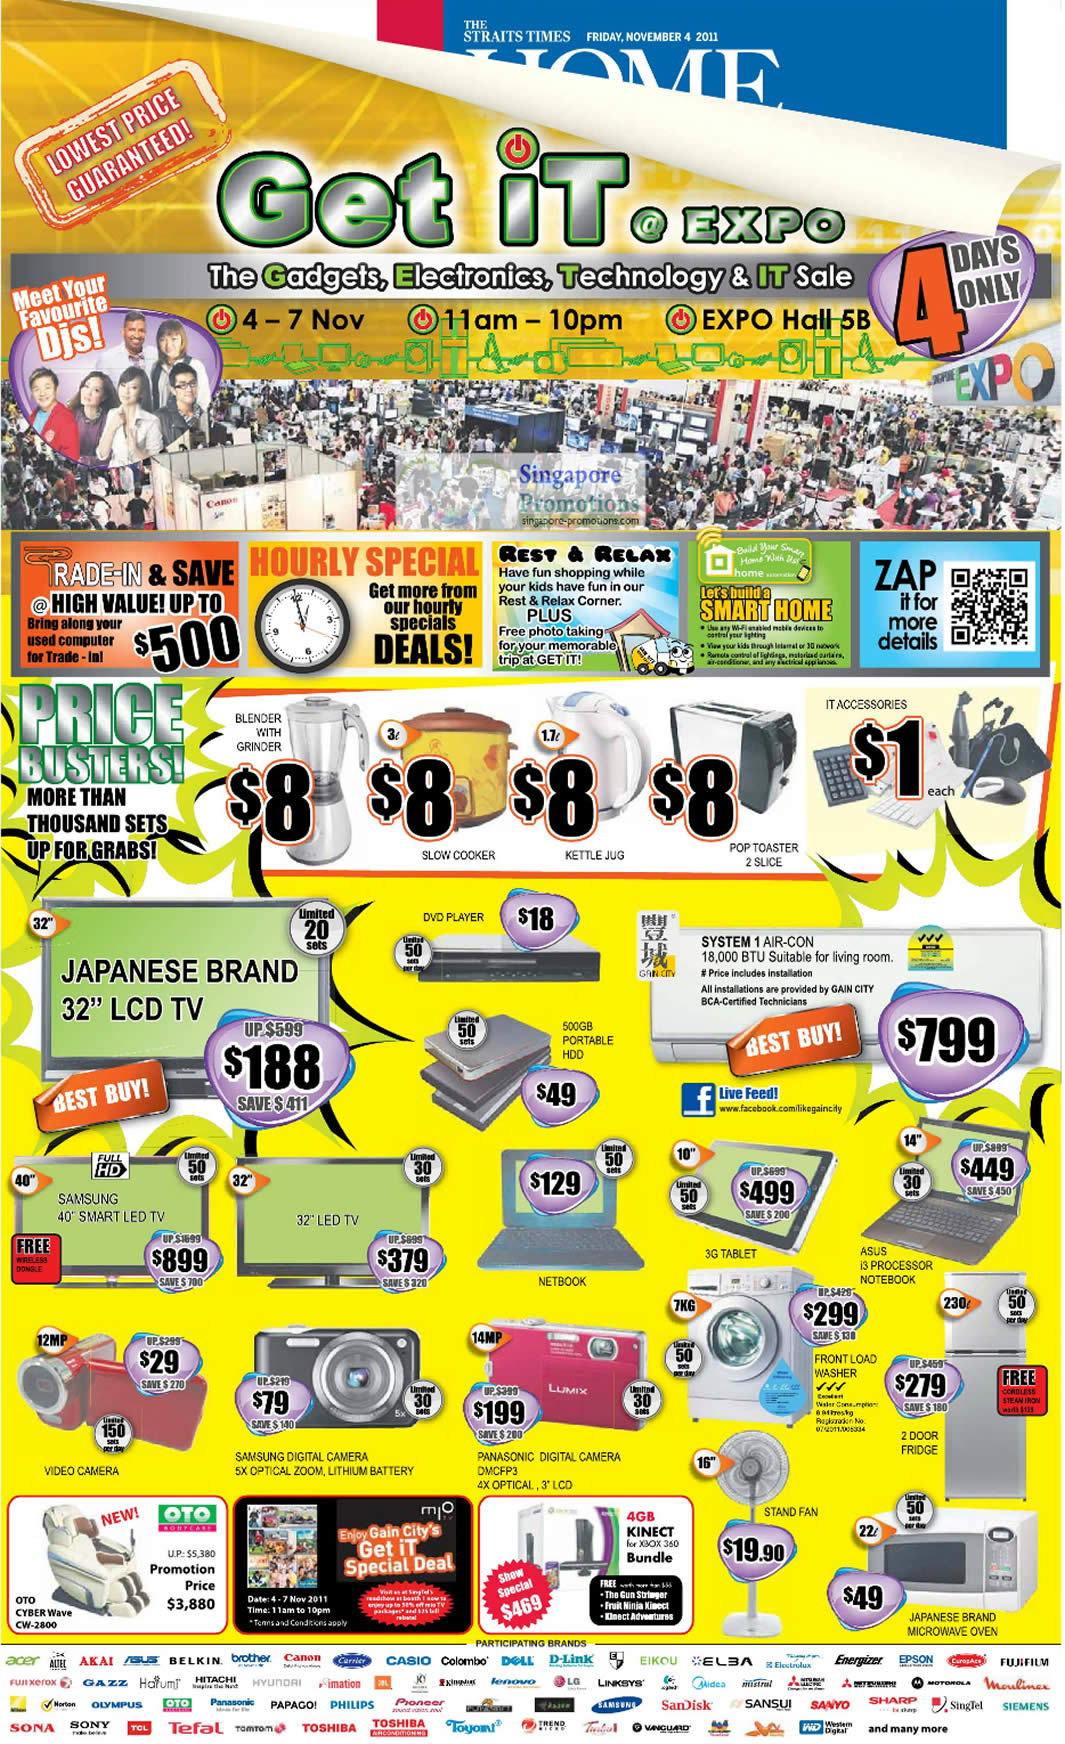 4 Nov 8 Dollar Limited Deals, Panasonic DMC-FP3 Digital Camera, TV, Notebook, Tablet, OTO Cyberwave CW-2800